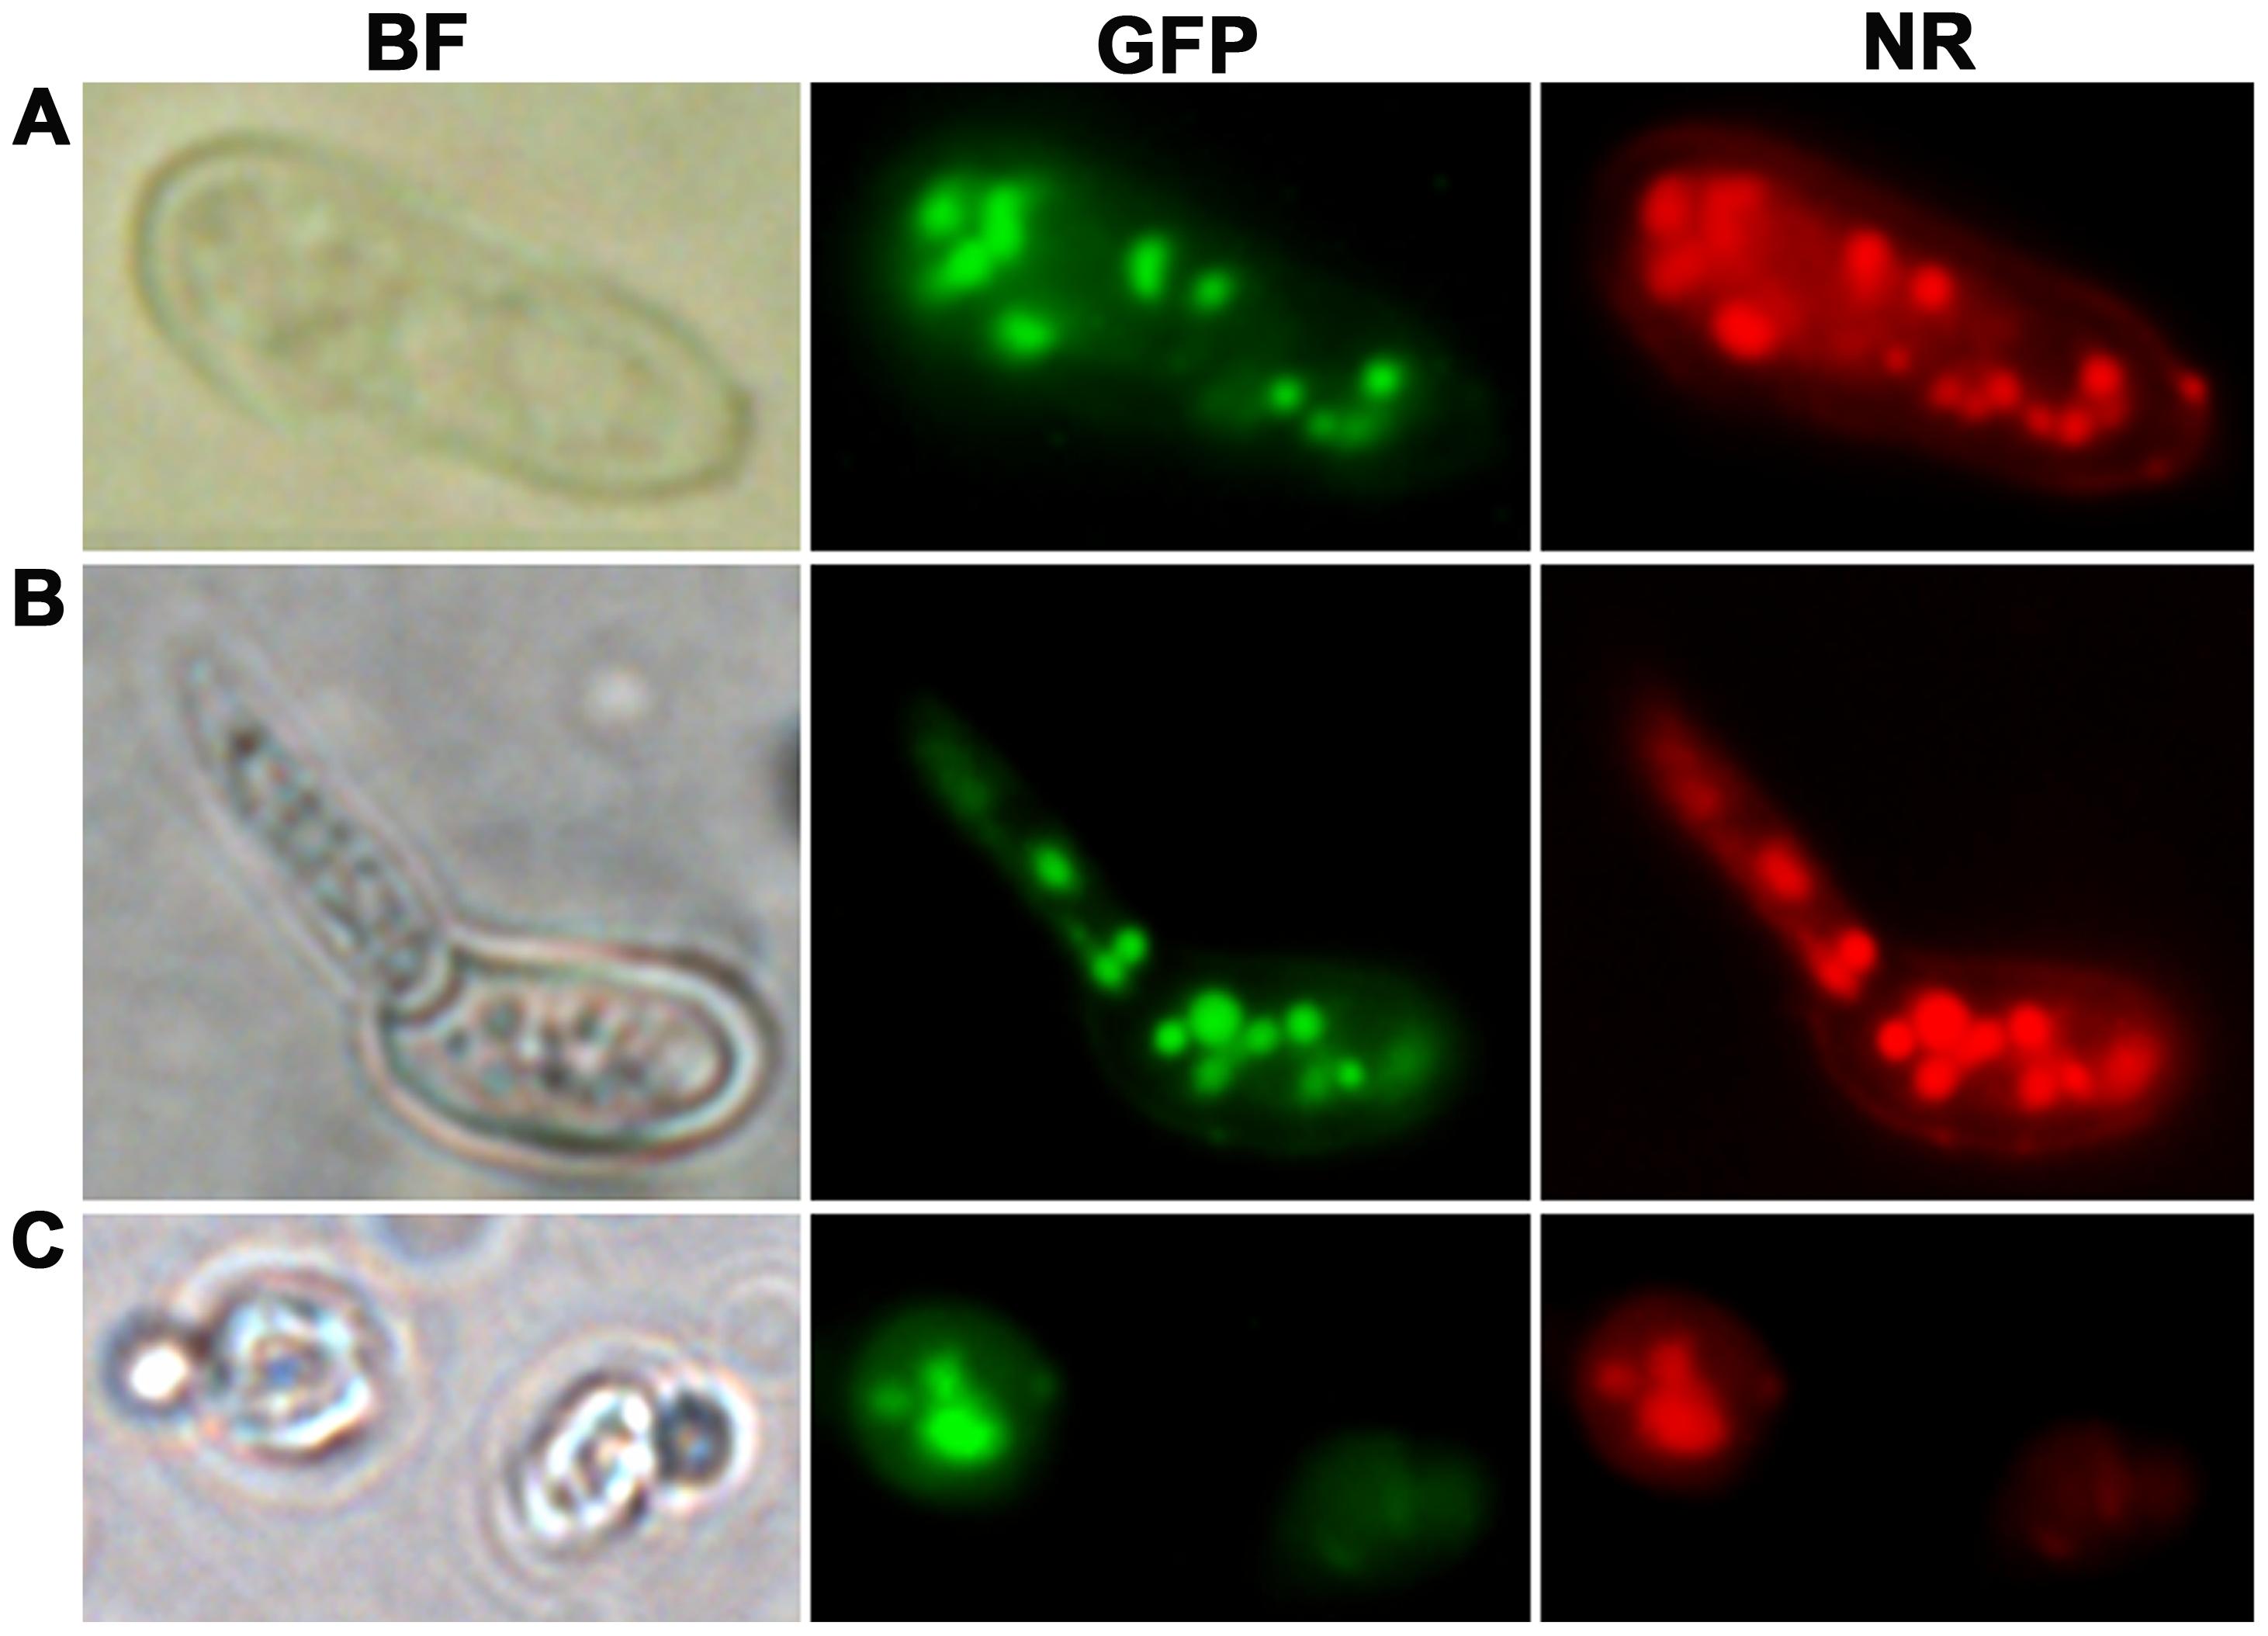 Intracellular localization of MEST1 in <i>Metarhizium robertsii</i> Mr2575 and budding yeast <i>Saccharomyces cerevisiae</i>.